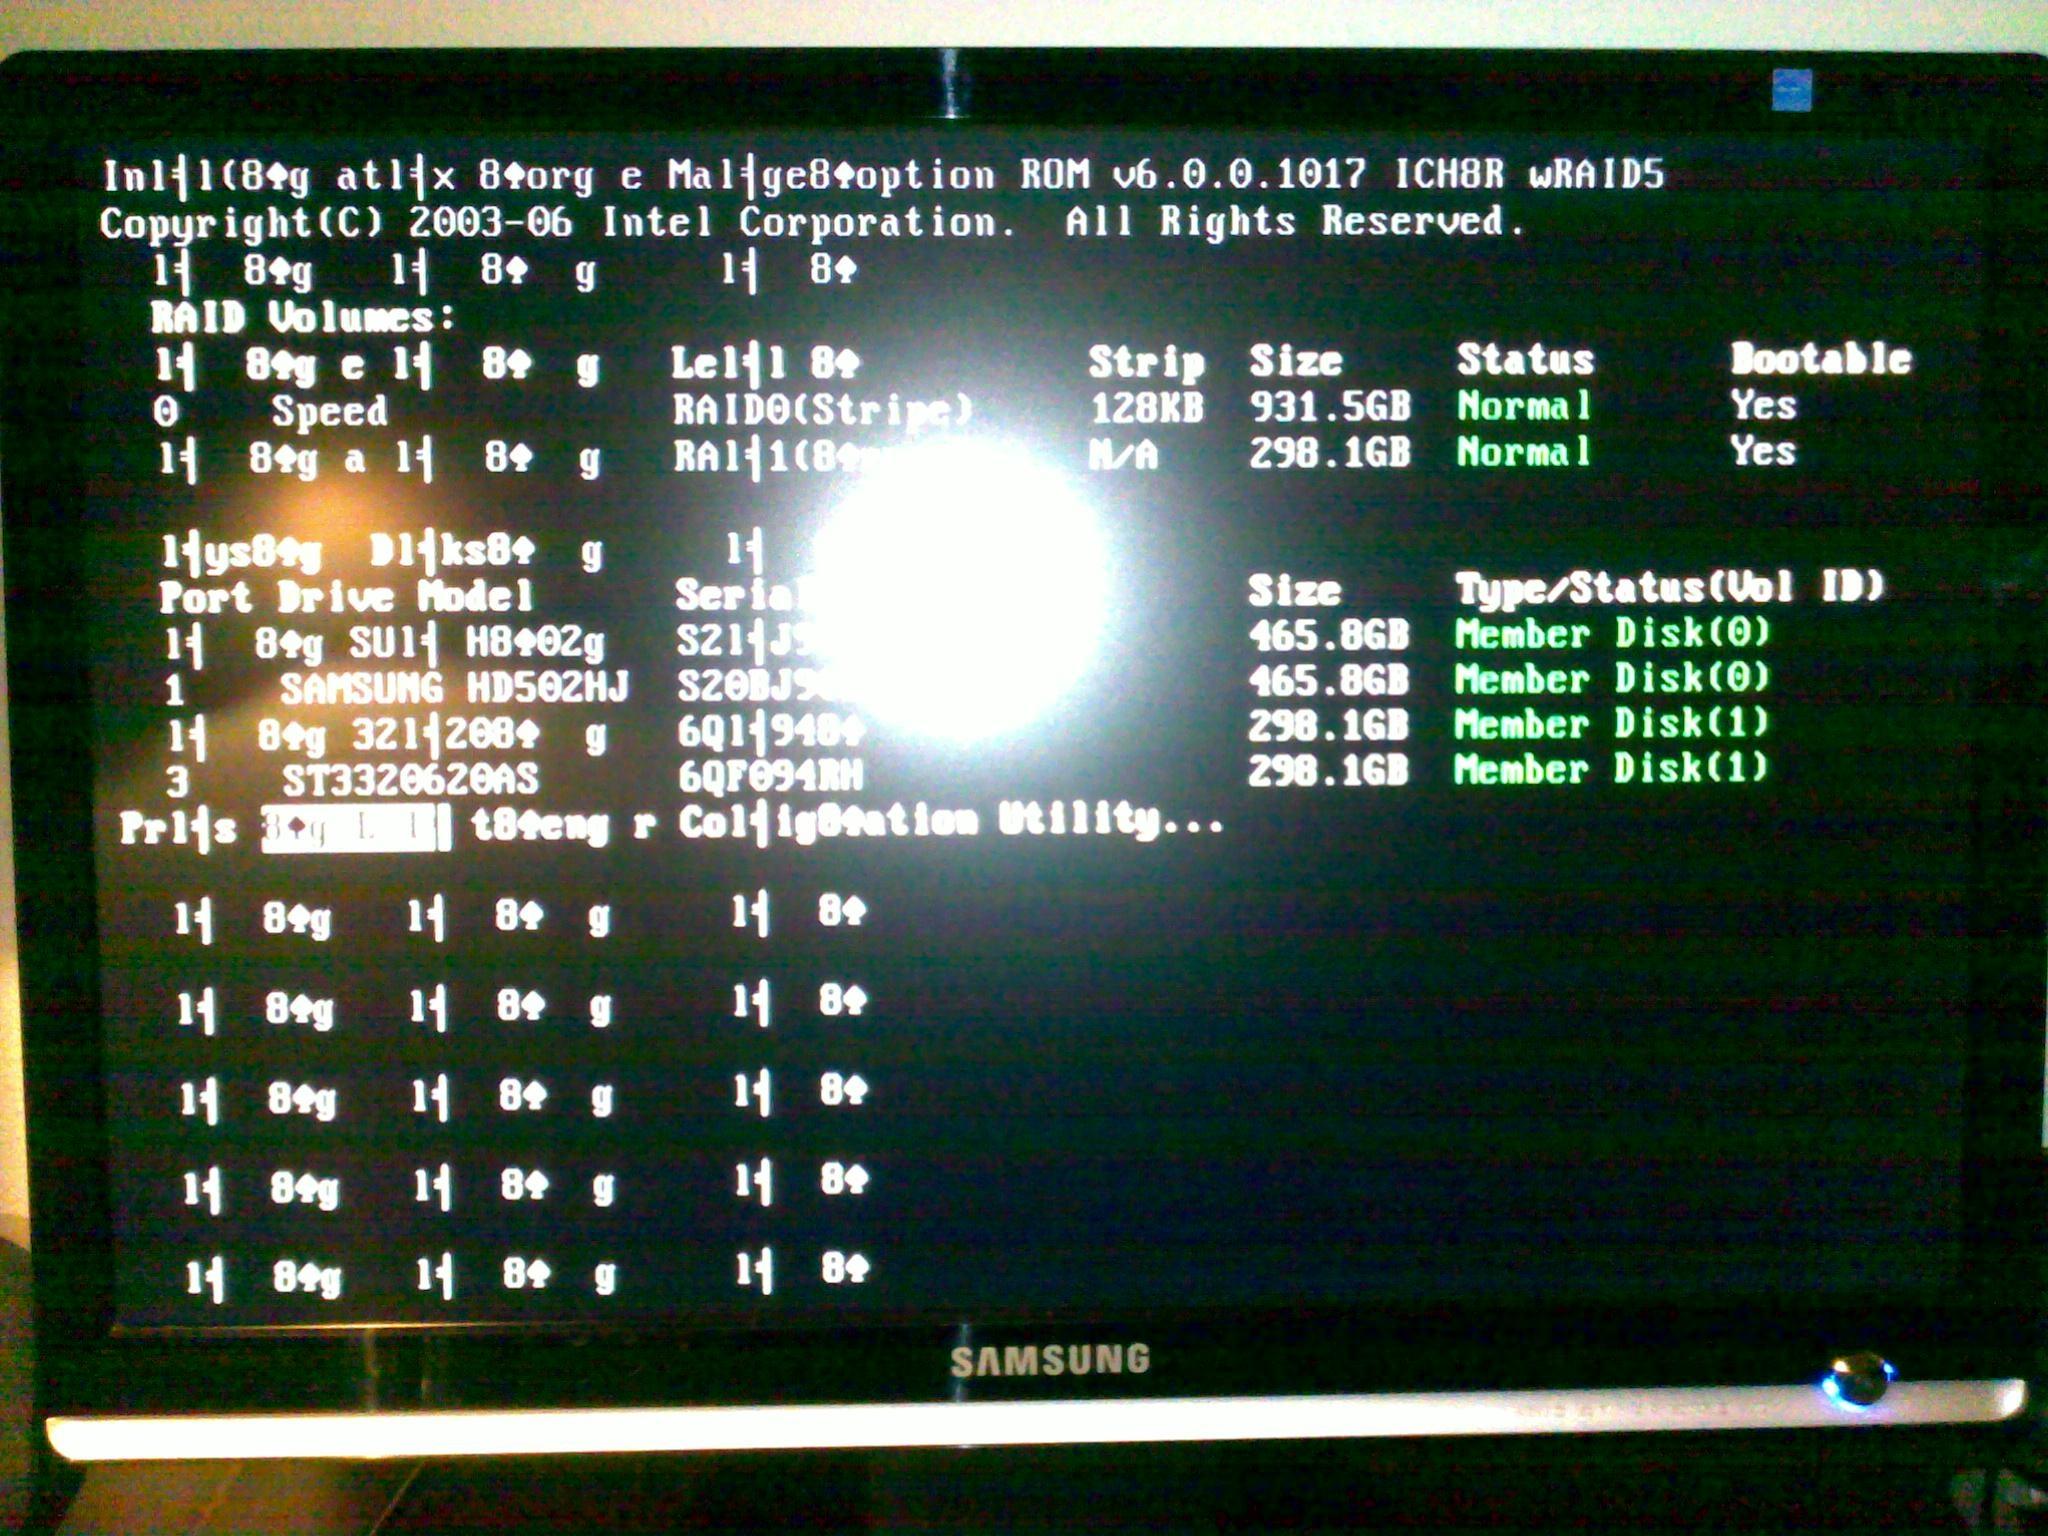 http://tweakers.net/ext/f/PlnFm5Hz8yCjSwqKW0m7vfFy/full.jpg